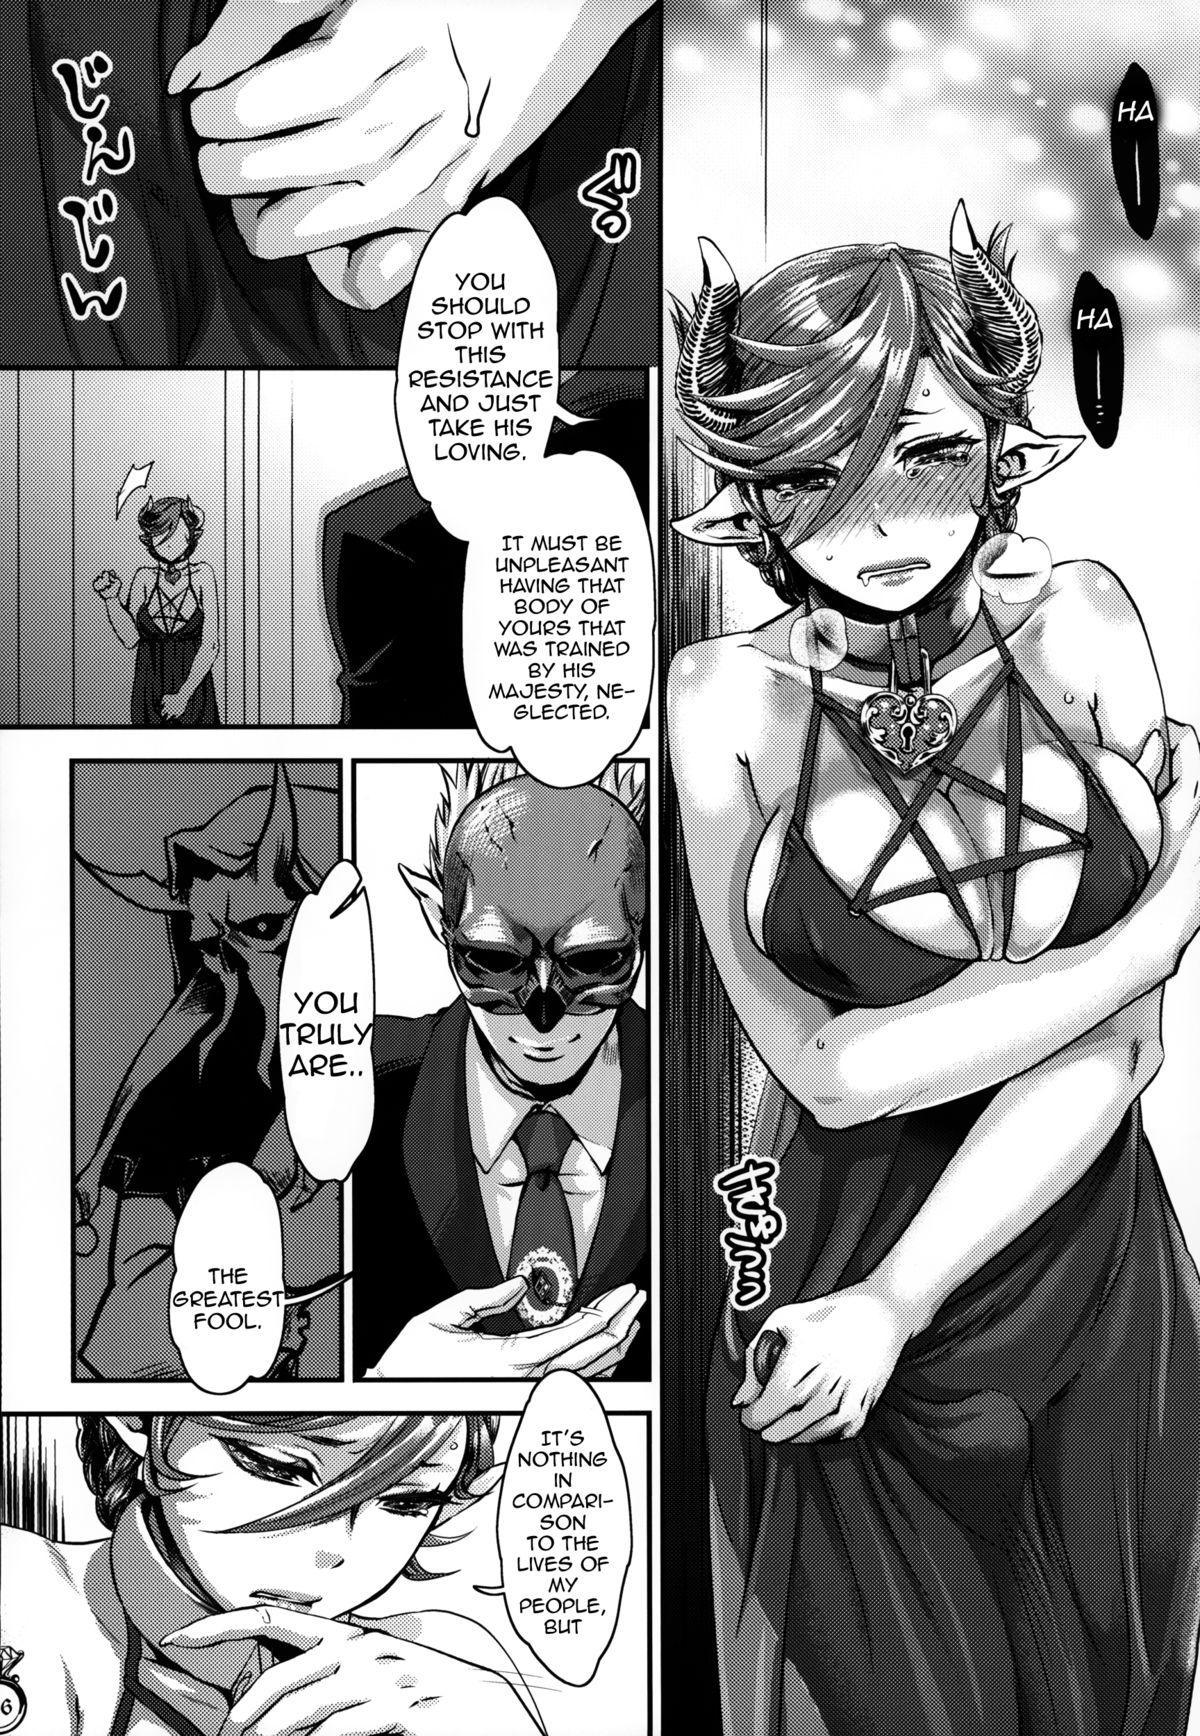 Kakka no Chouki-sama | The Mistress of His Excellency 24